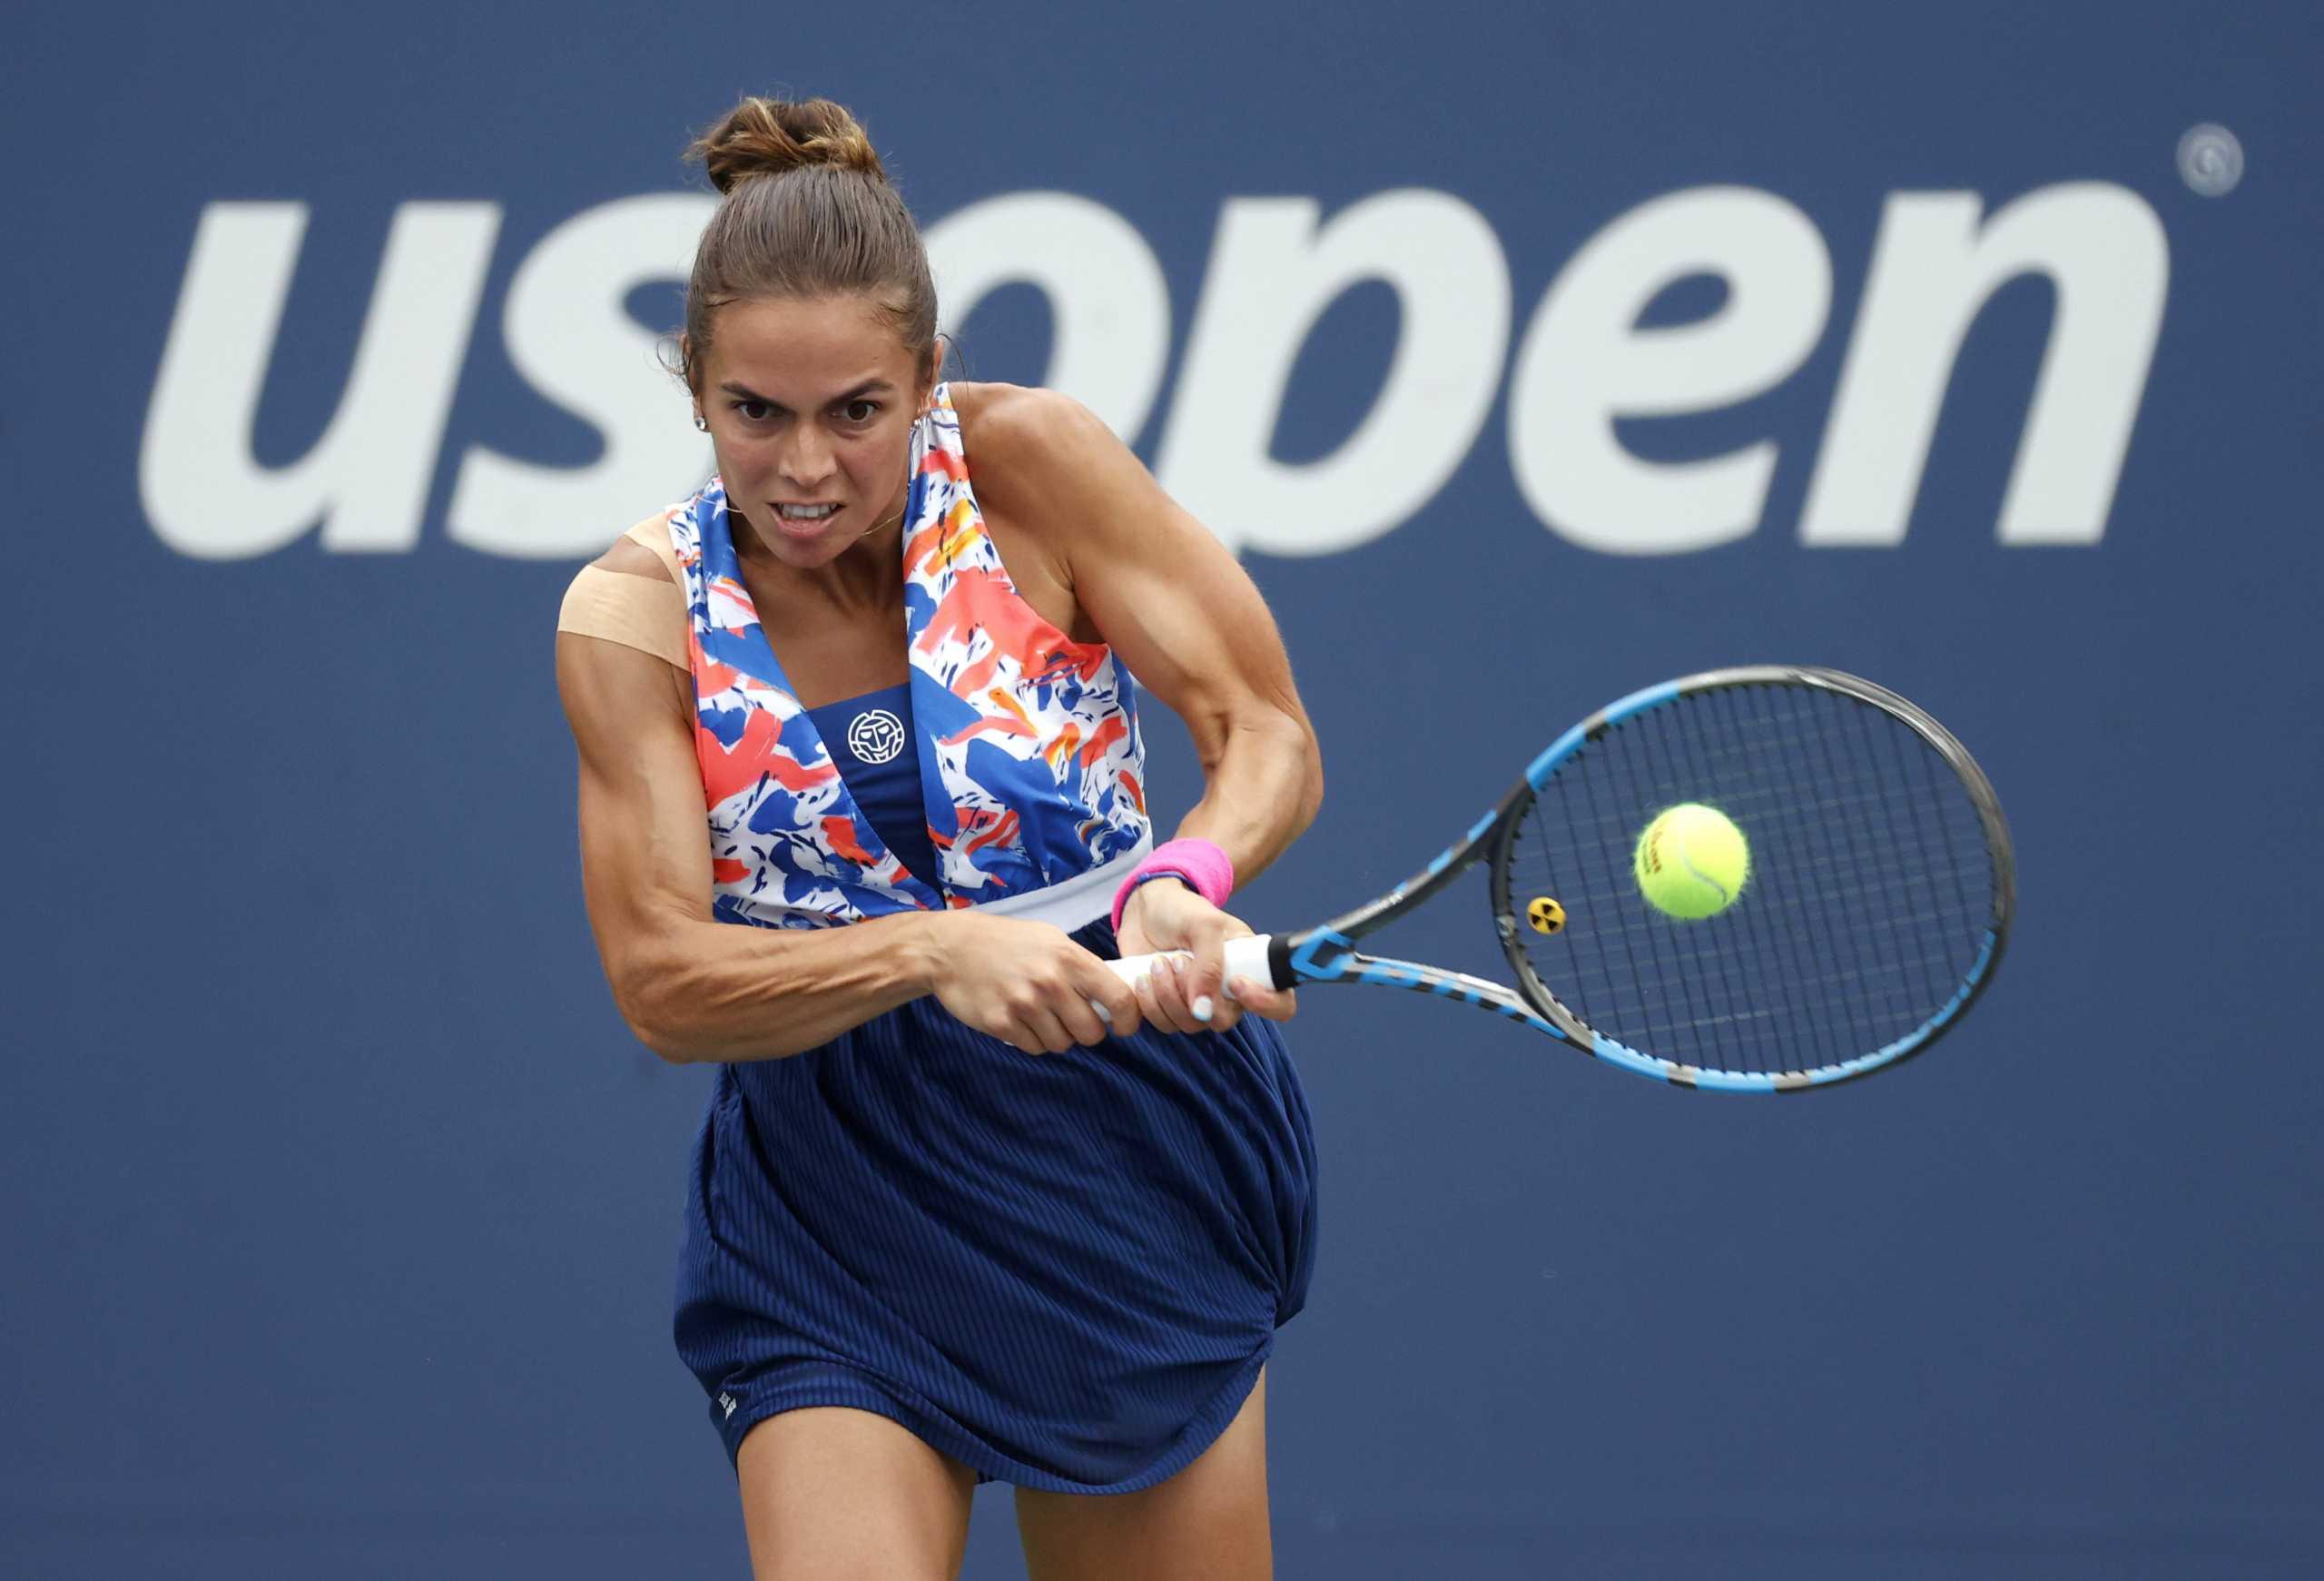 US Open: Πάλεψε αλλά «λύγισε» και αποκλείστηκε η Γραμματικοπούλου